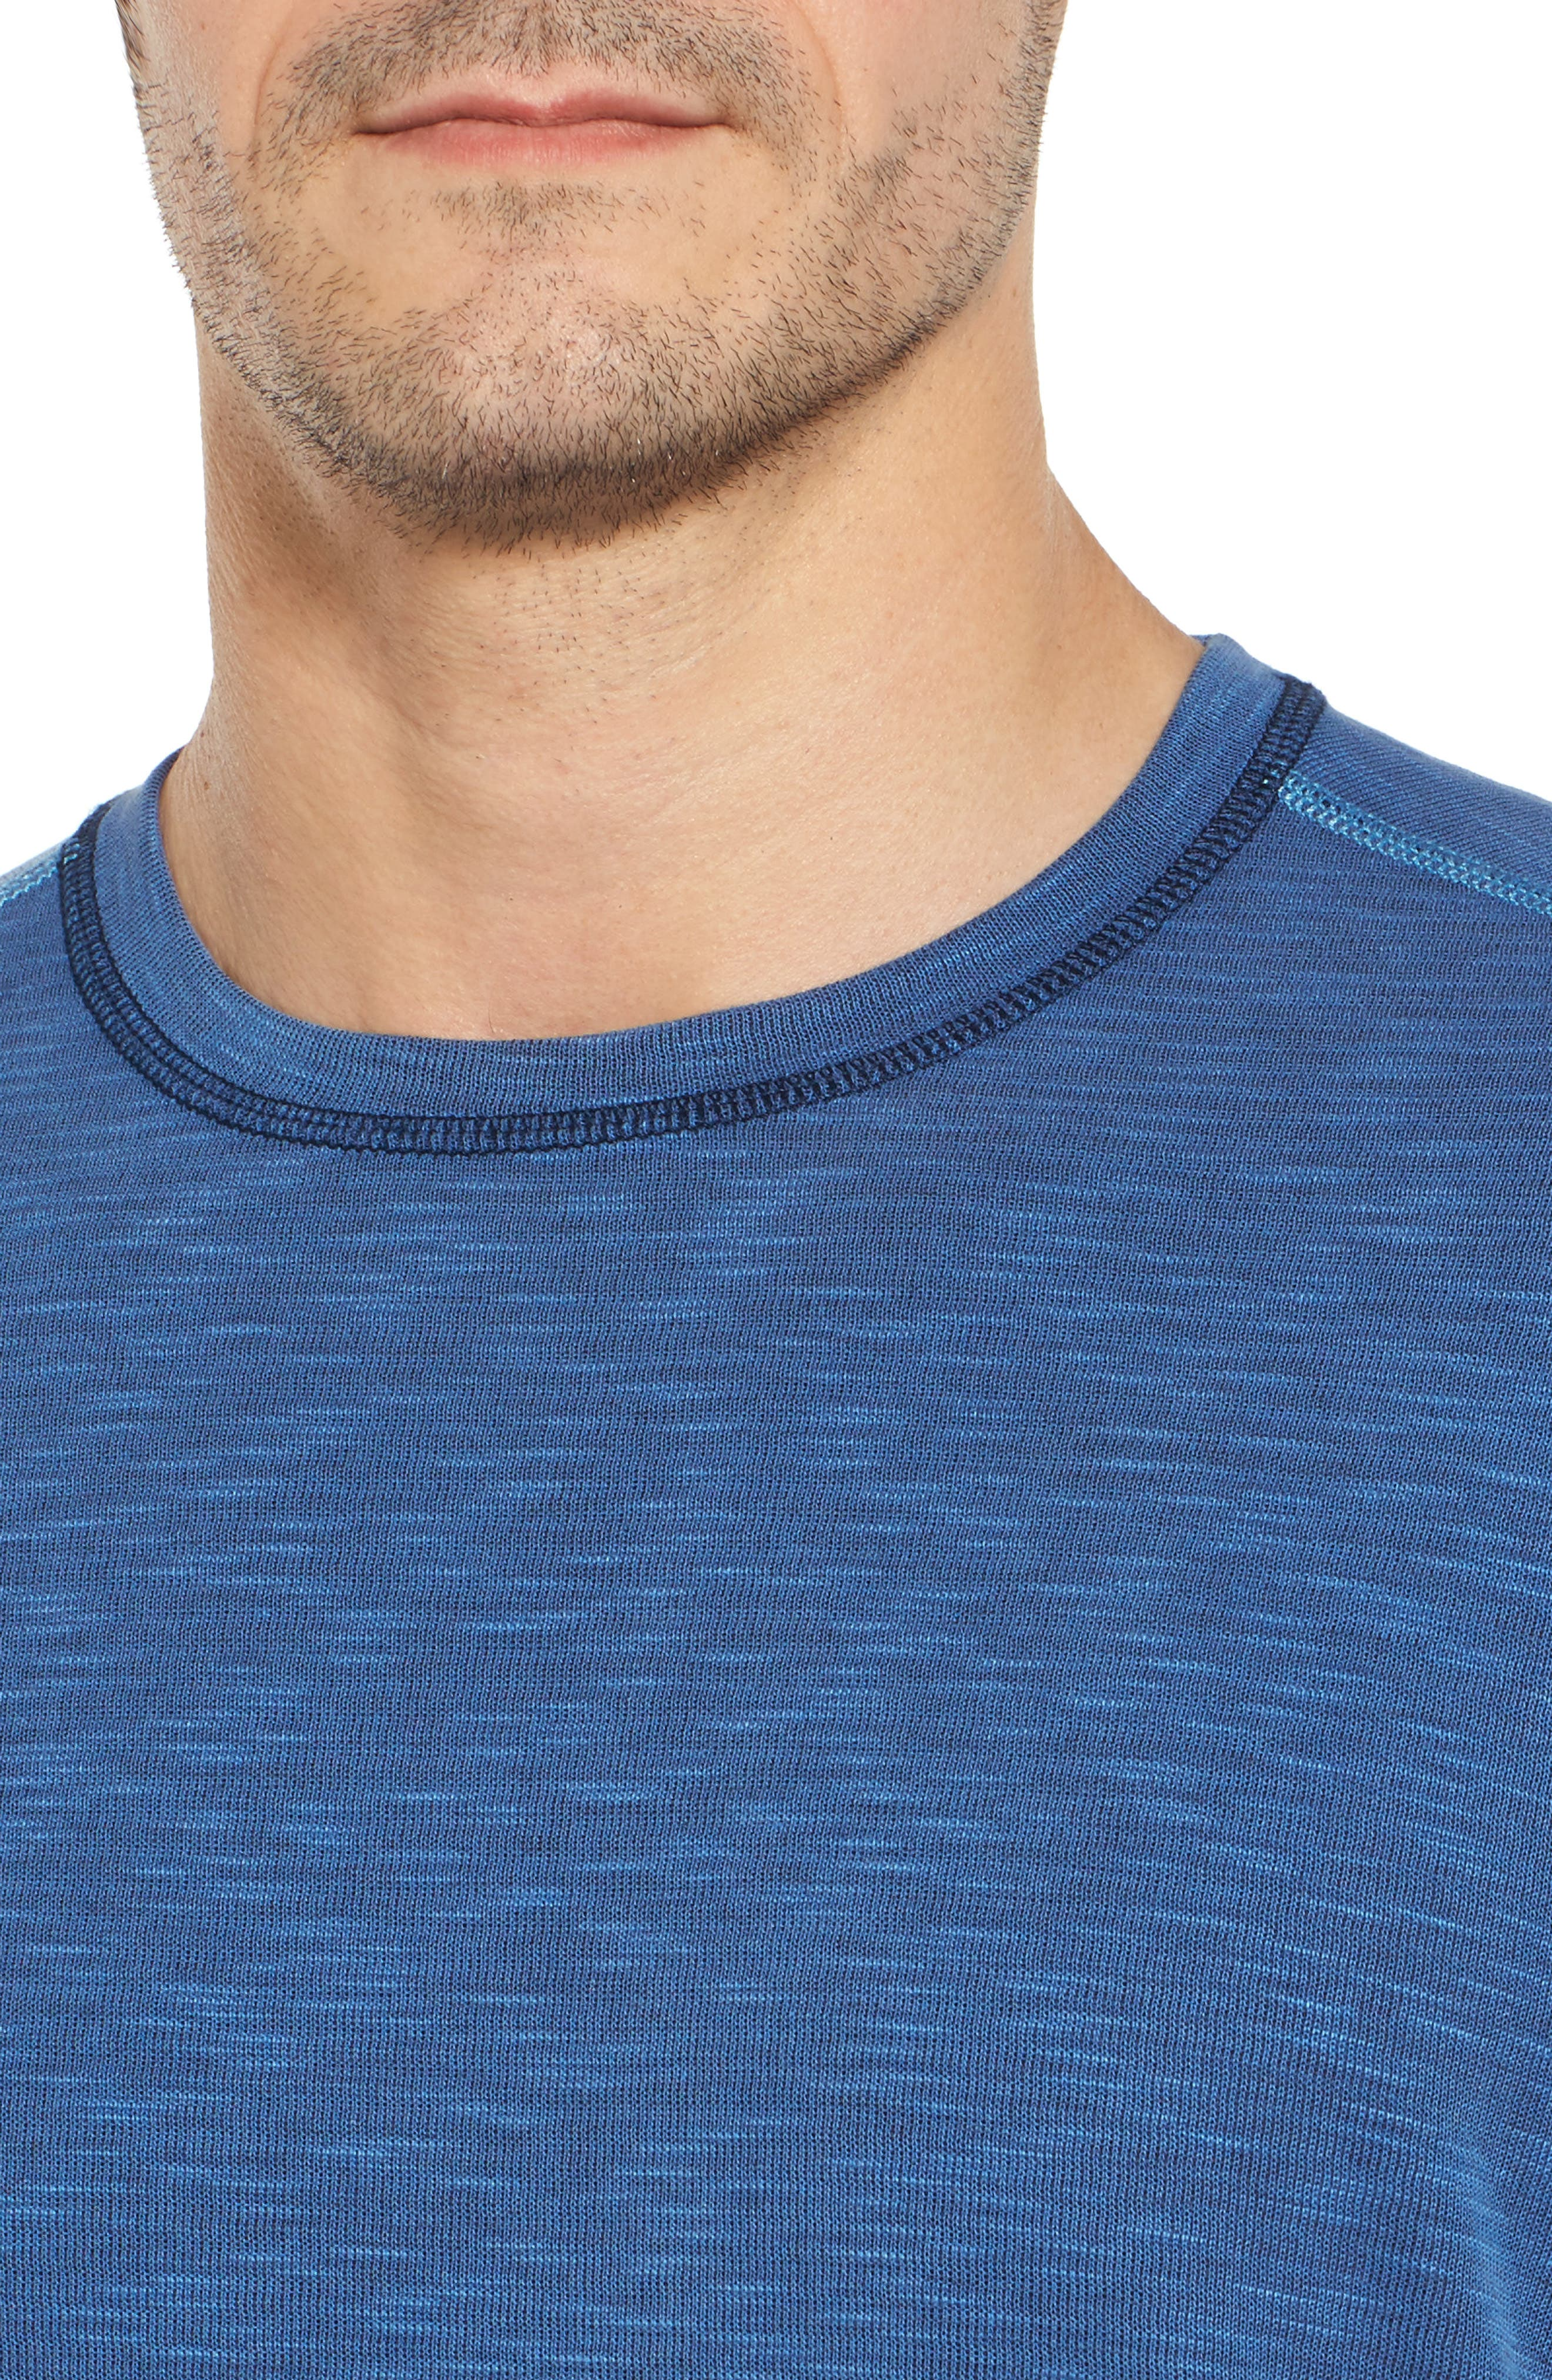 Flip Tide T-Shirt,                             Alternate thumbnail 37, color,